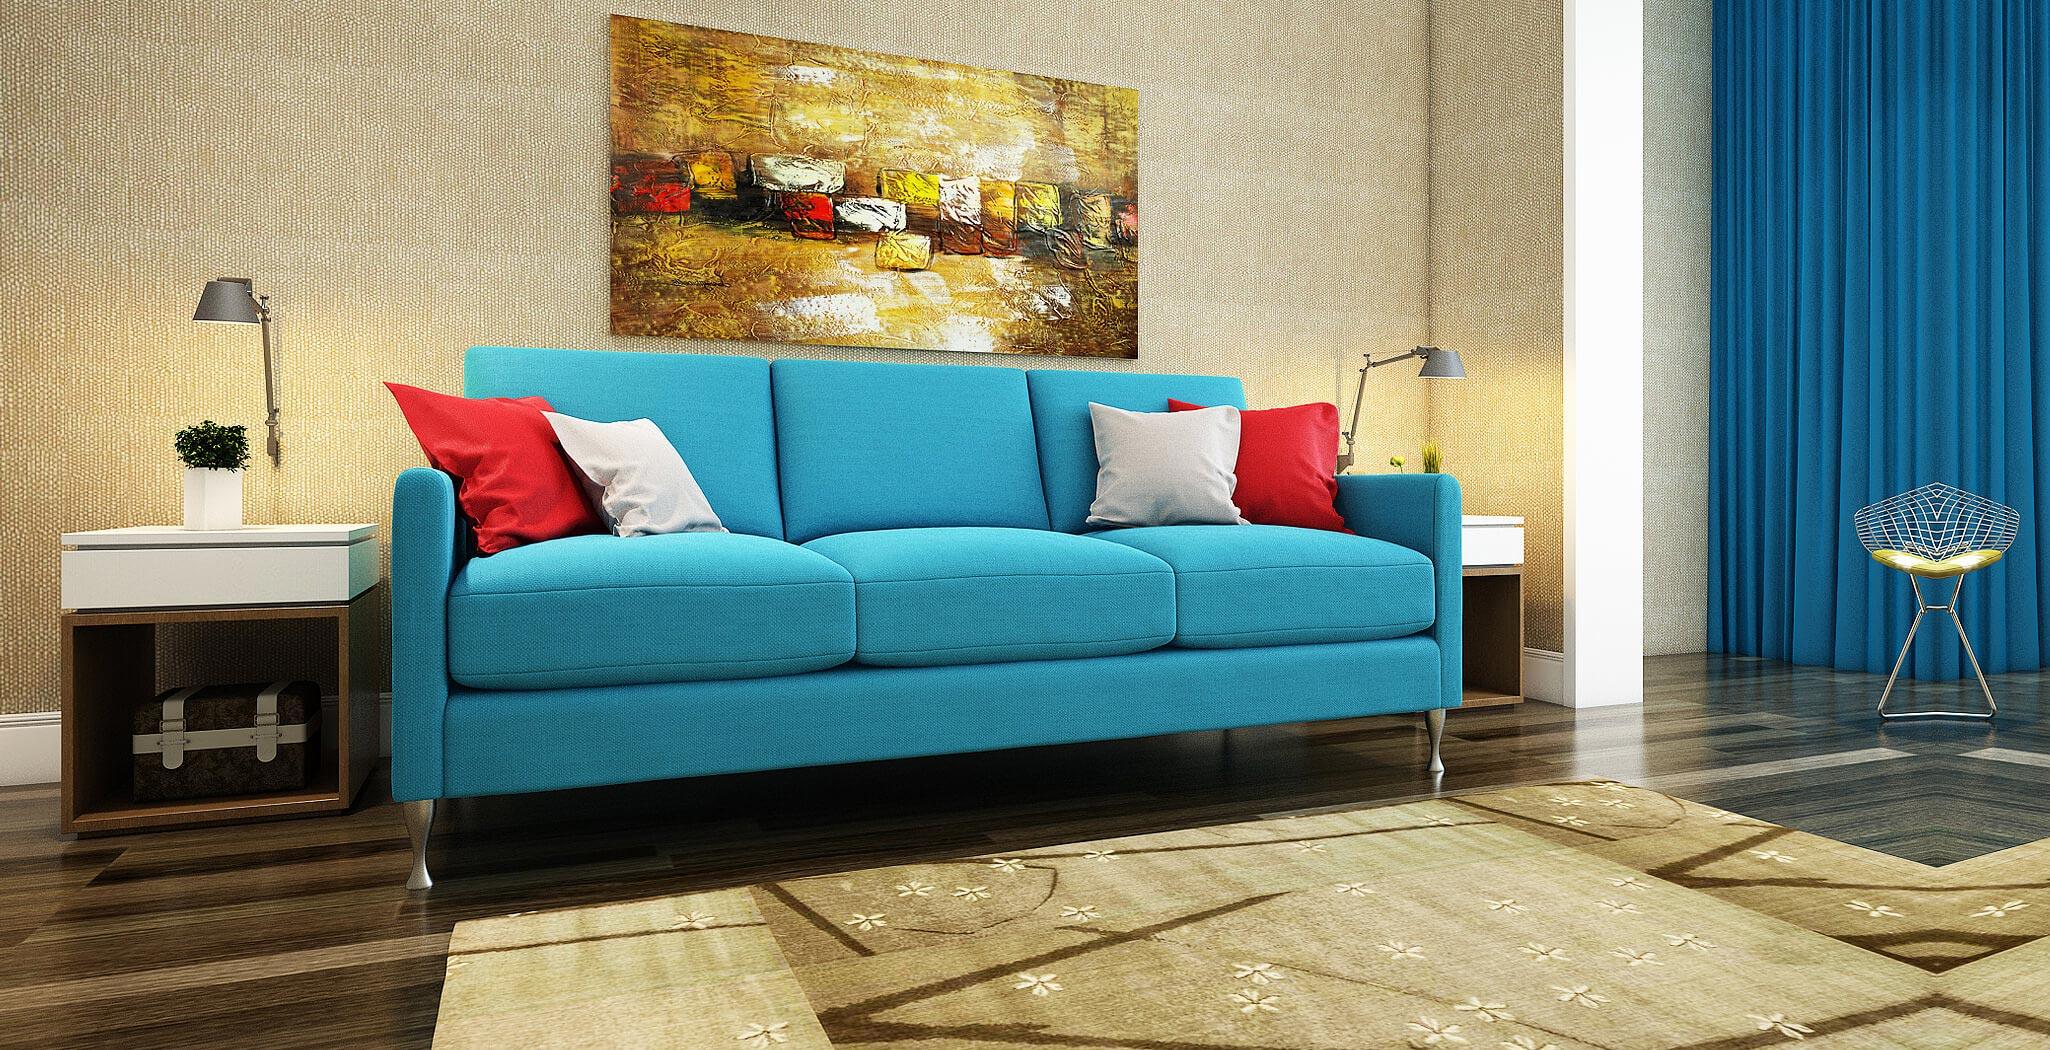 eureka sofa furniture gallery 5